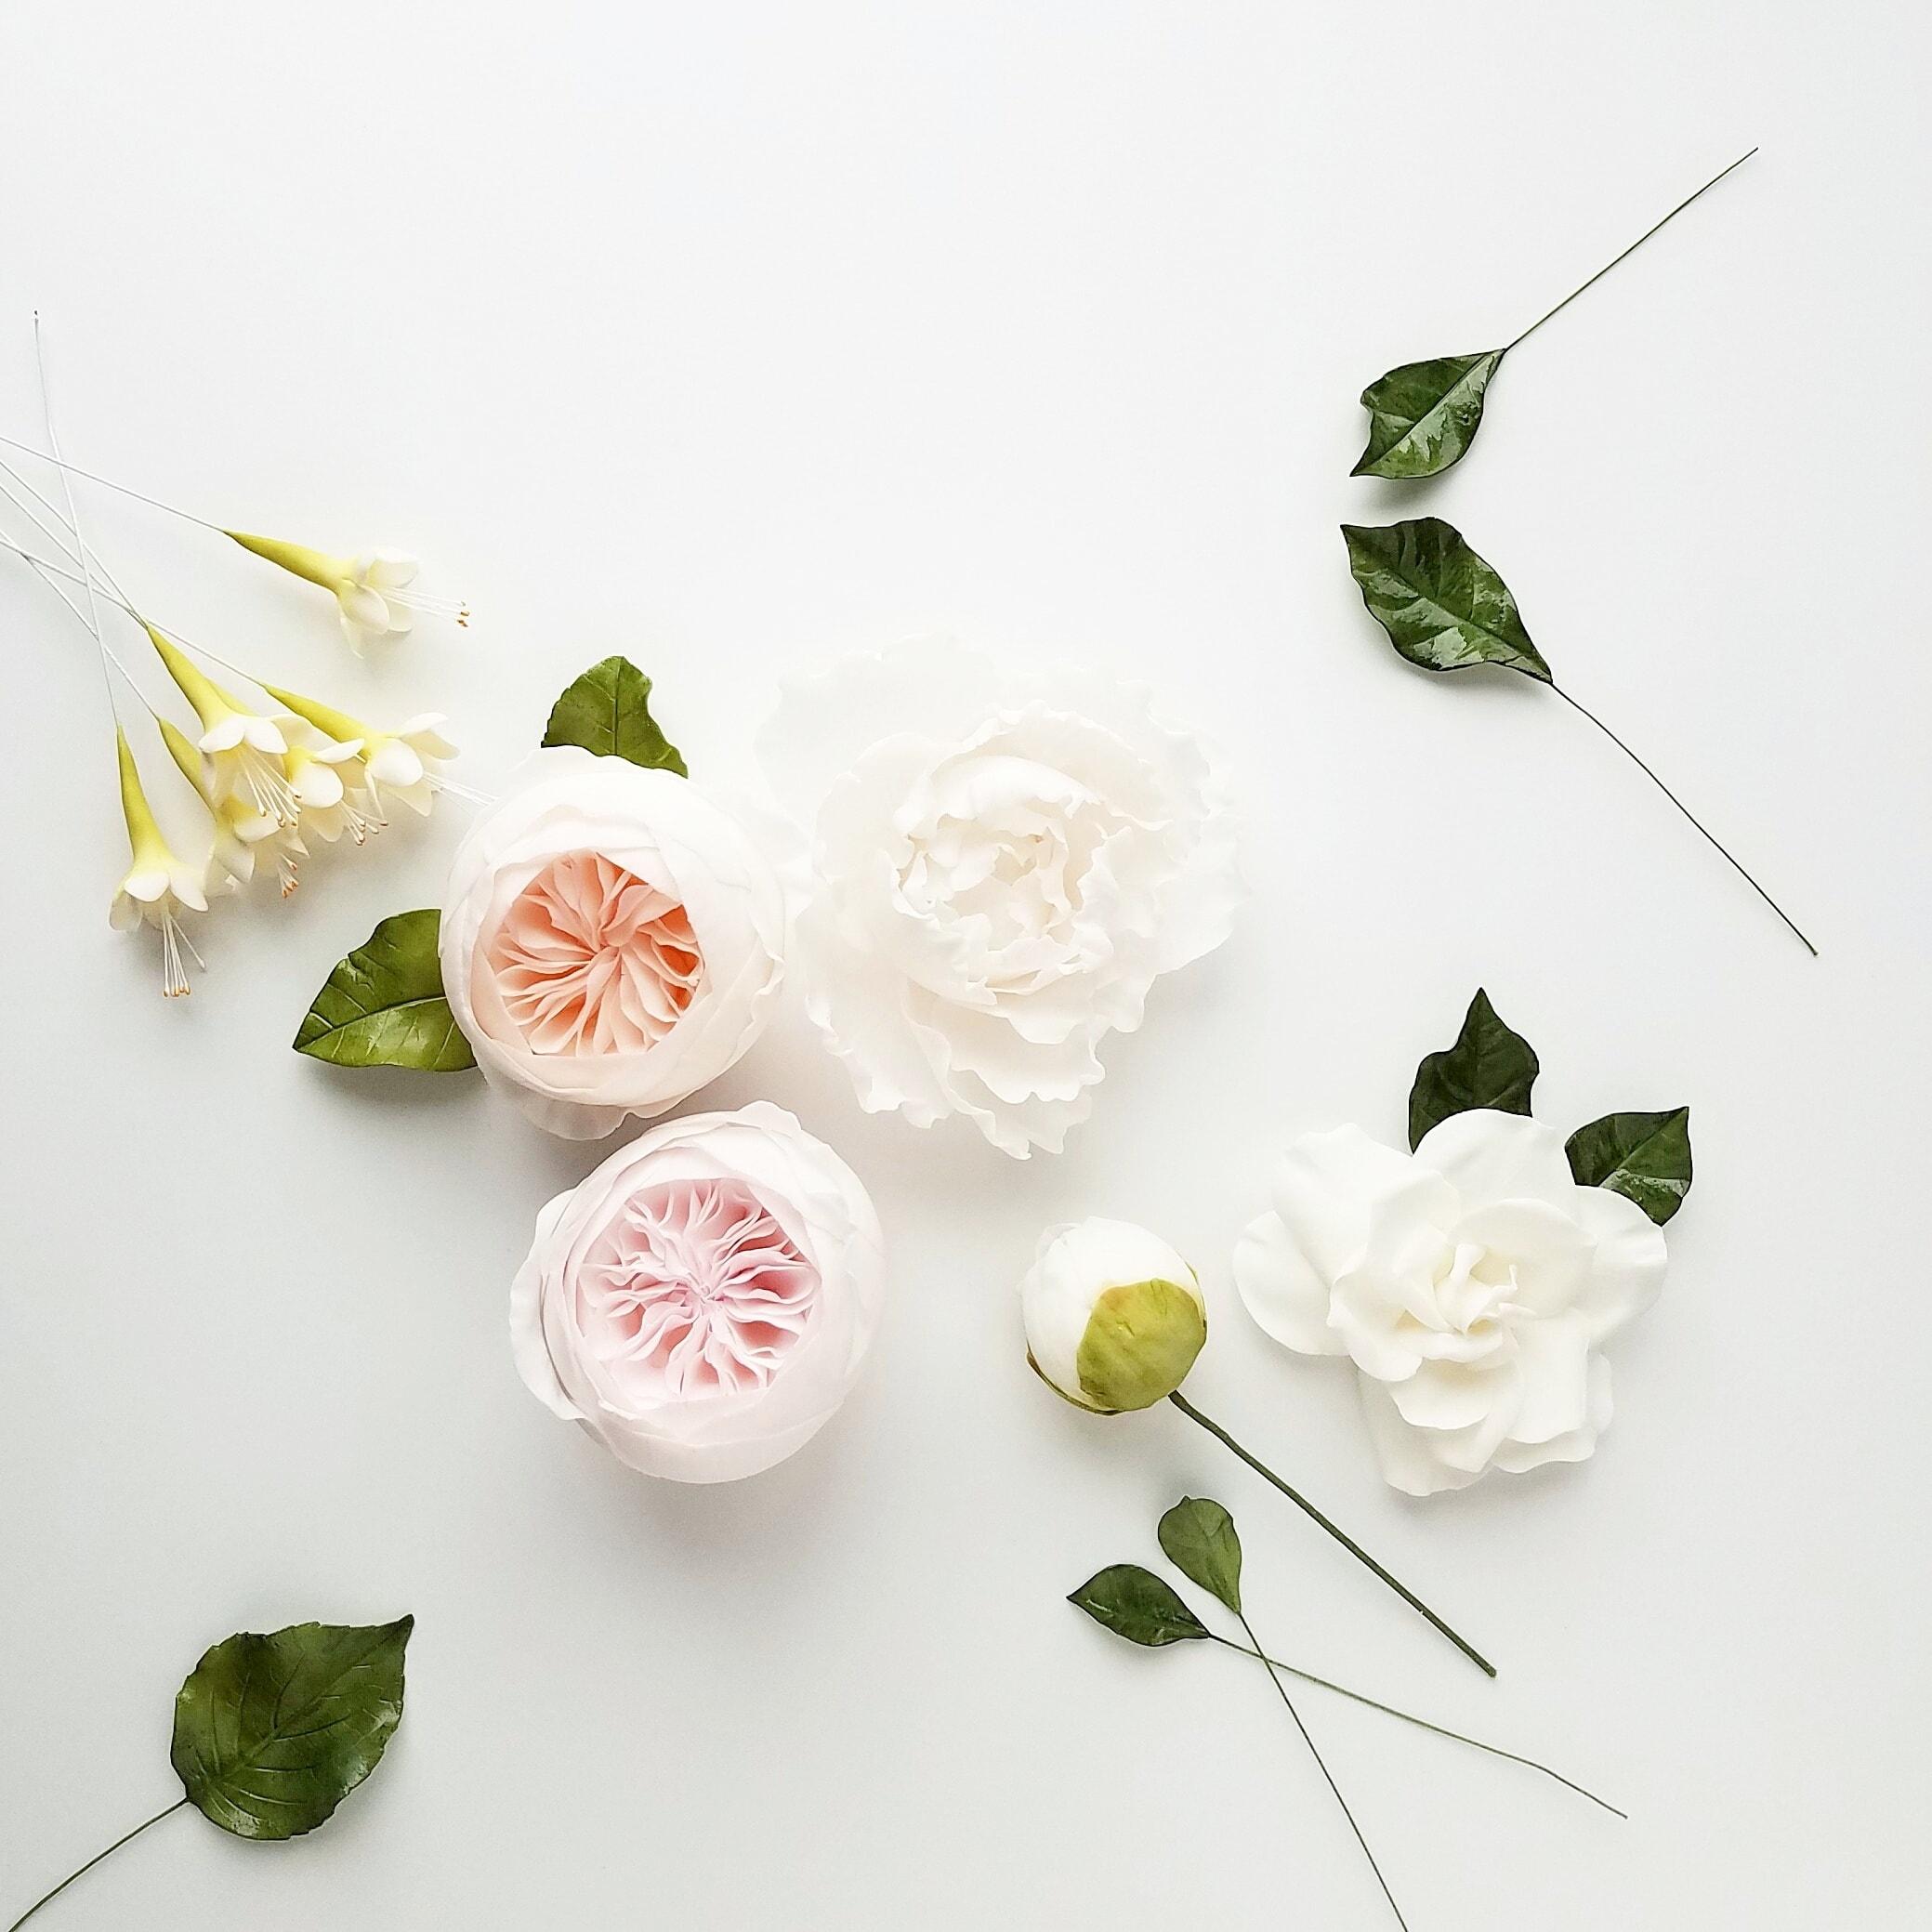 Petalsweet petalsweet izmirmasajfo